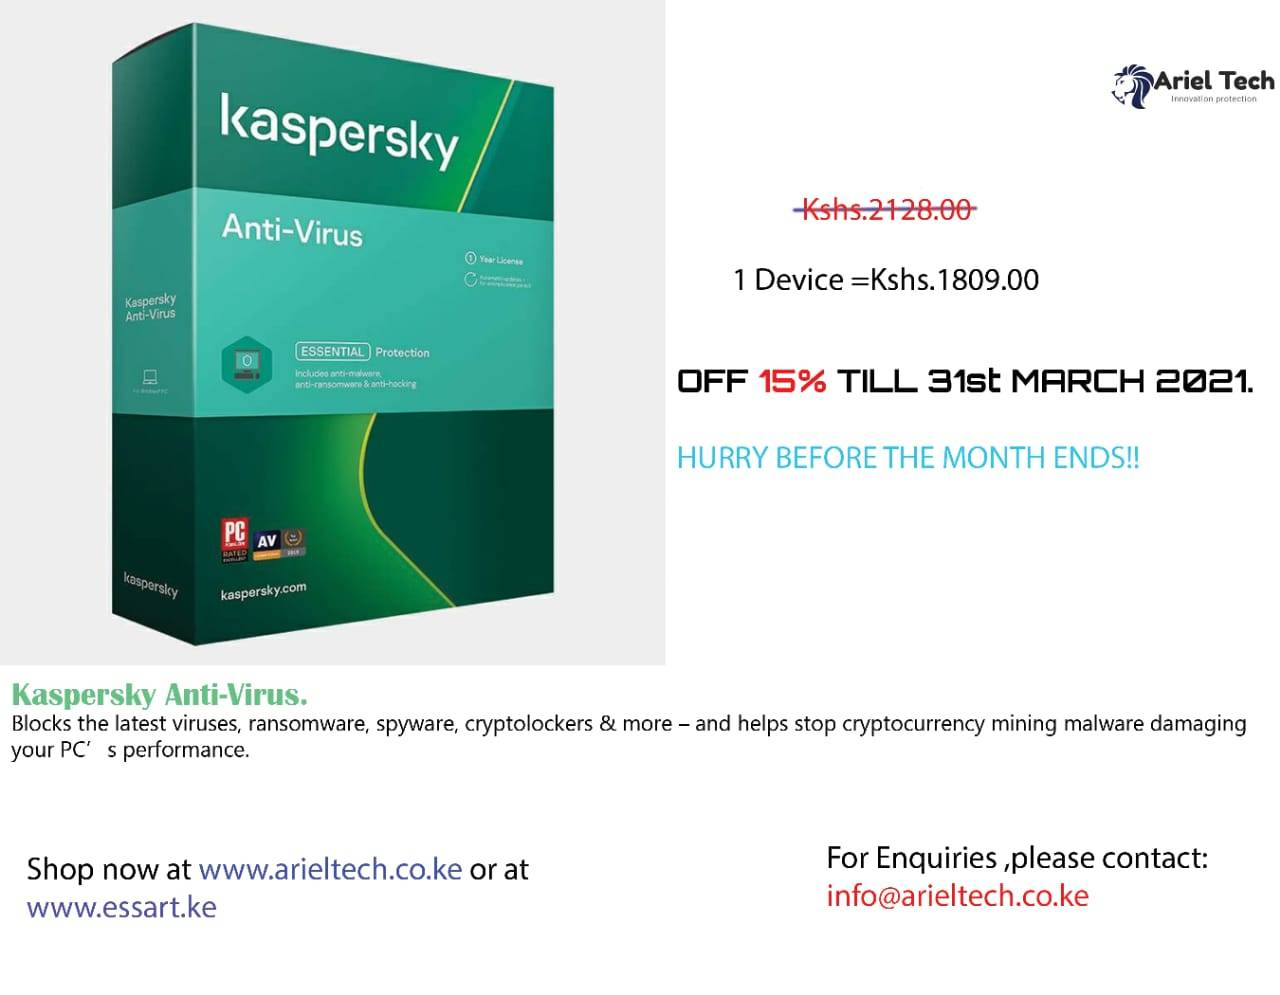 kaspersky march offer